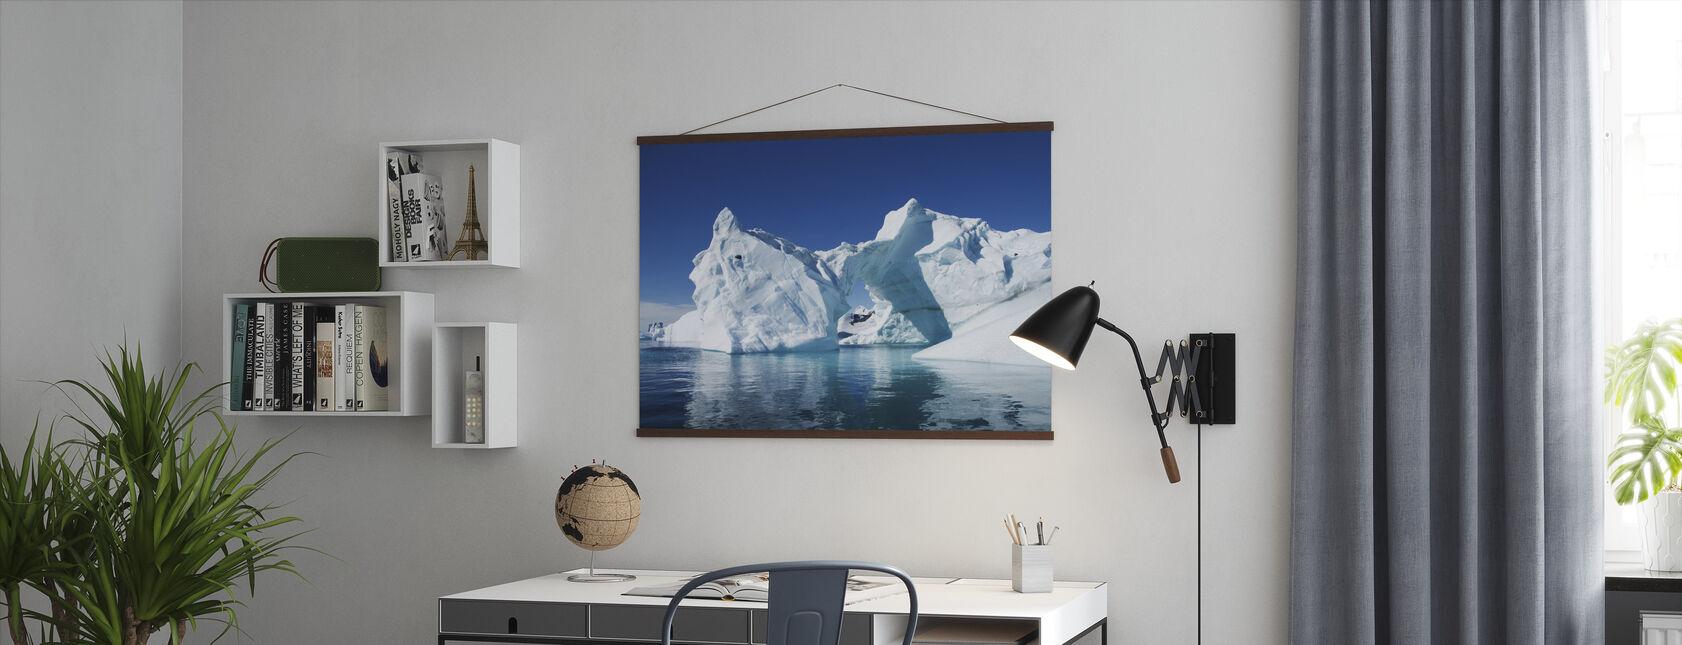 Iceberg Antarctica - Poster - Office